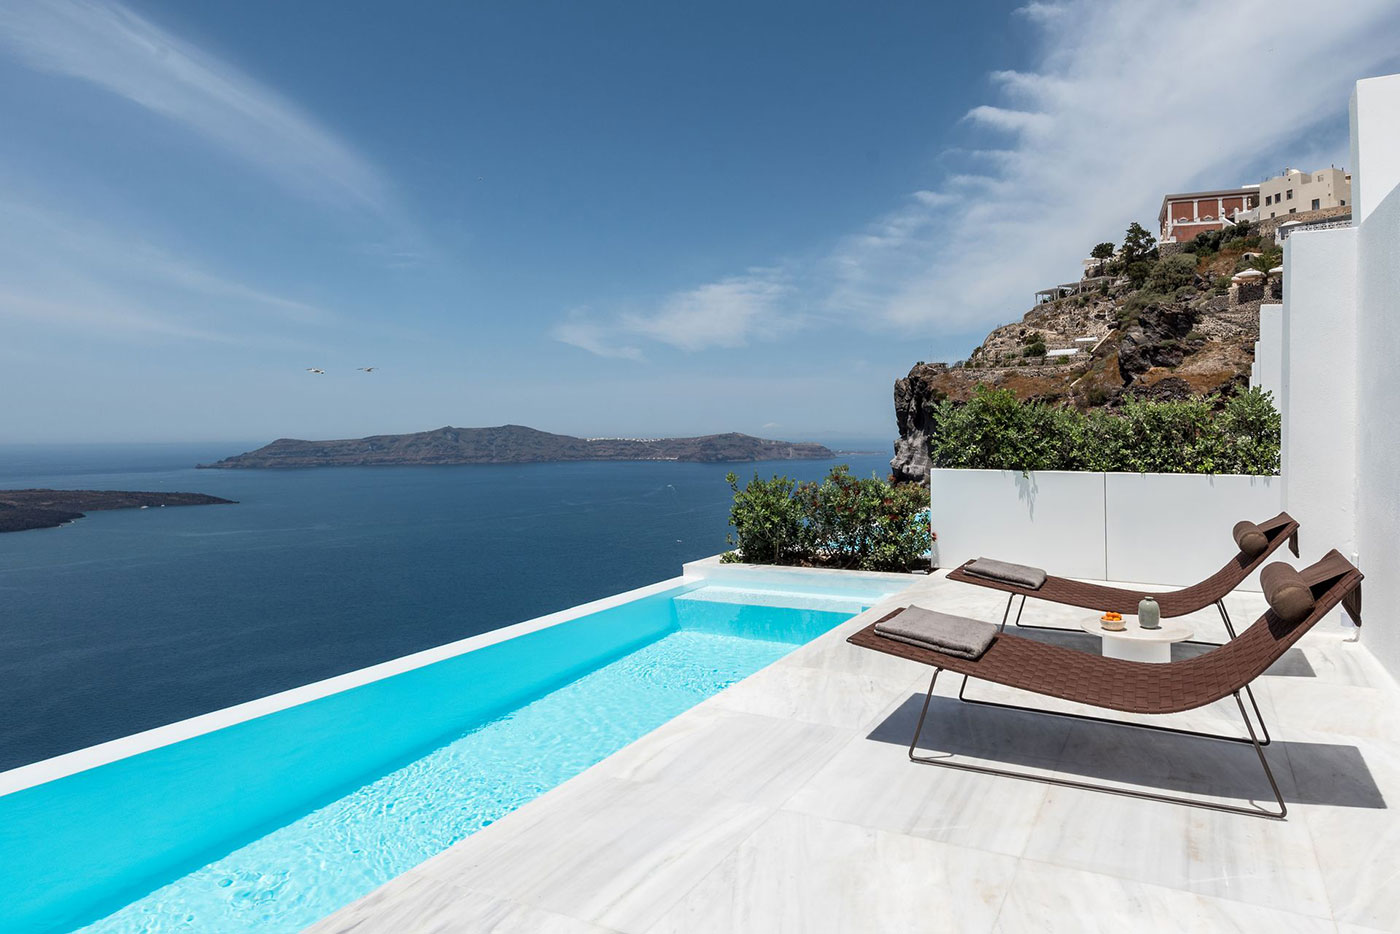 9 of the Best Honeymoon Hotels & Villas in Santorini